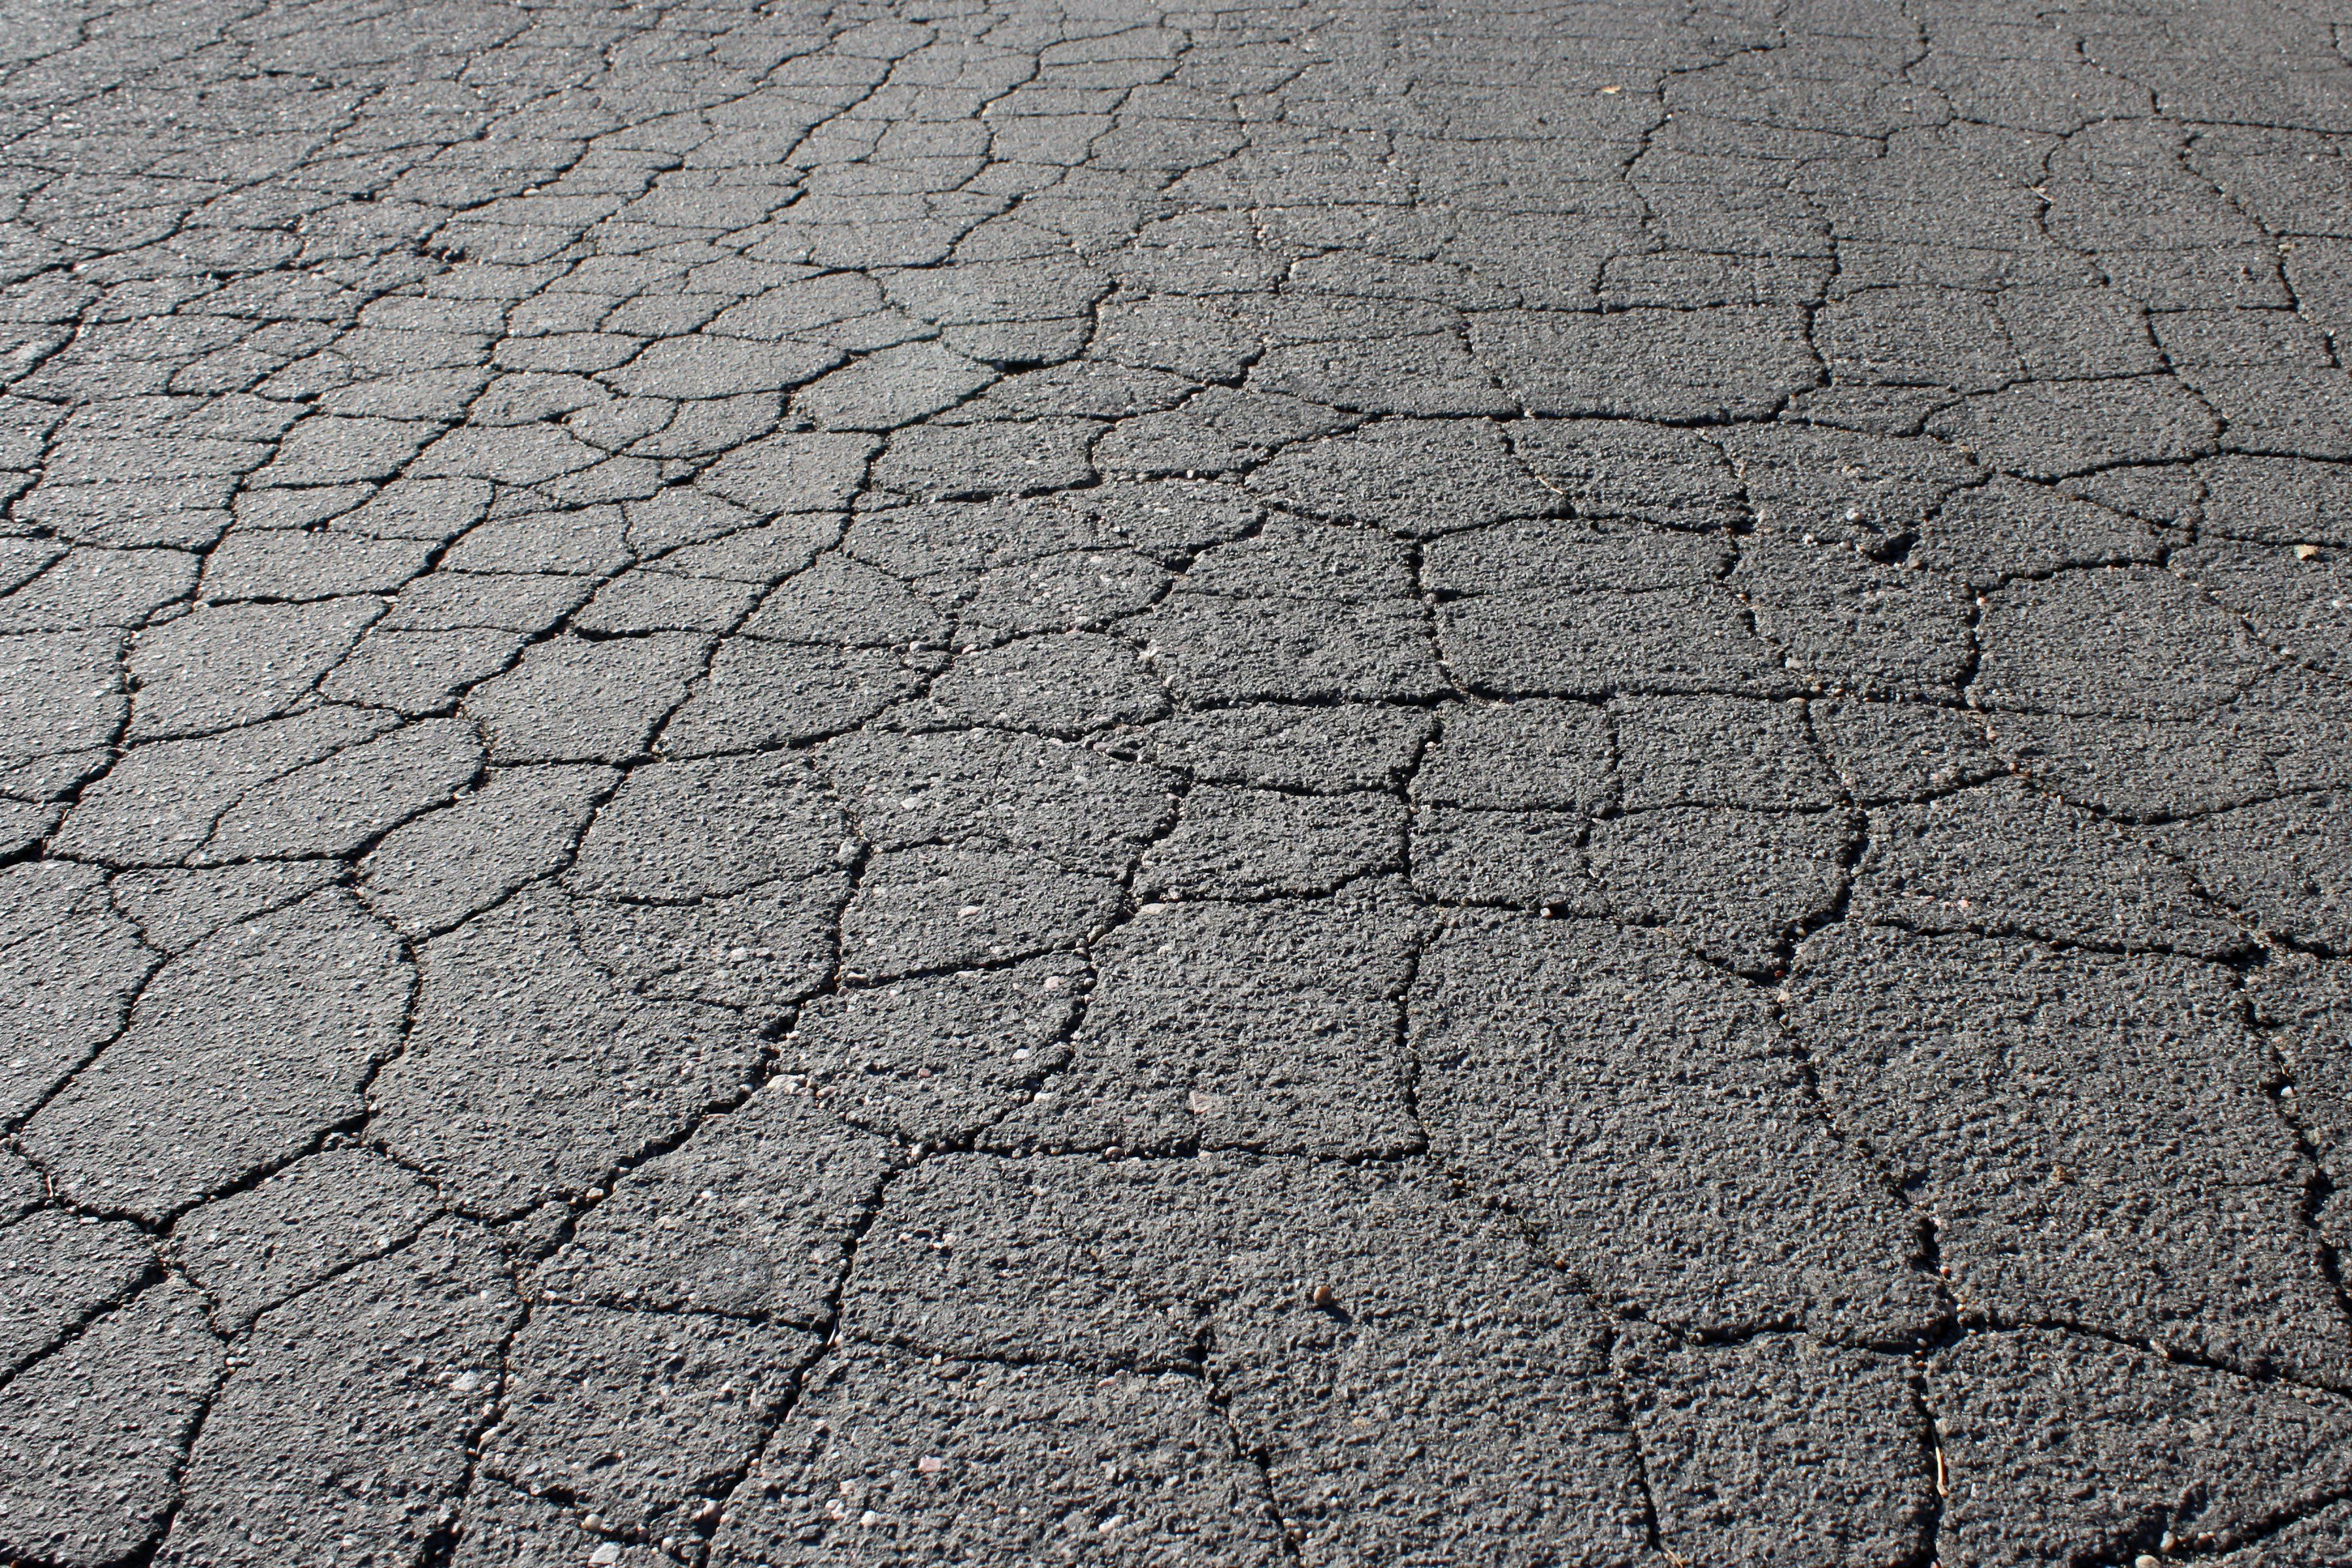 Urban Fruit A Film By Roman Zenz Asphalt Repair Pavement Black Sand